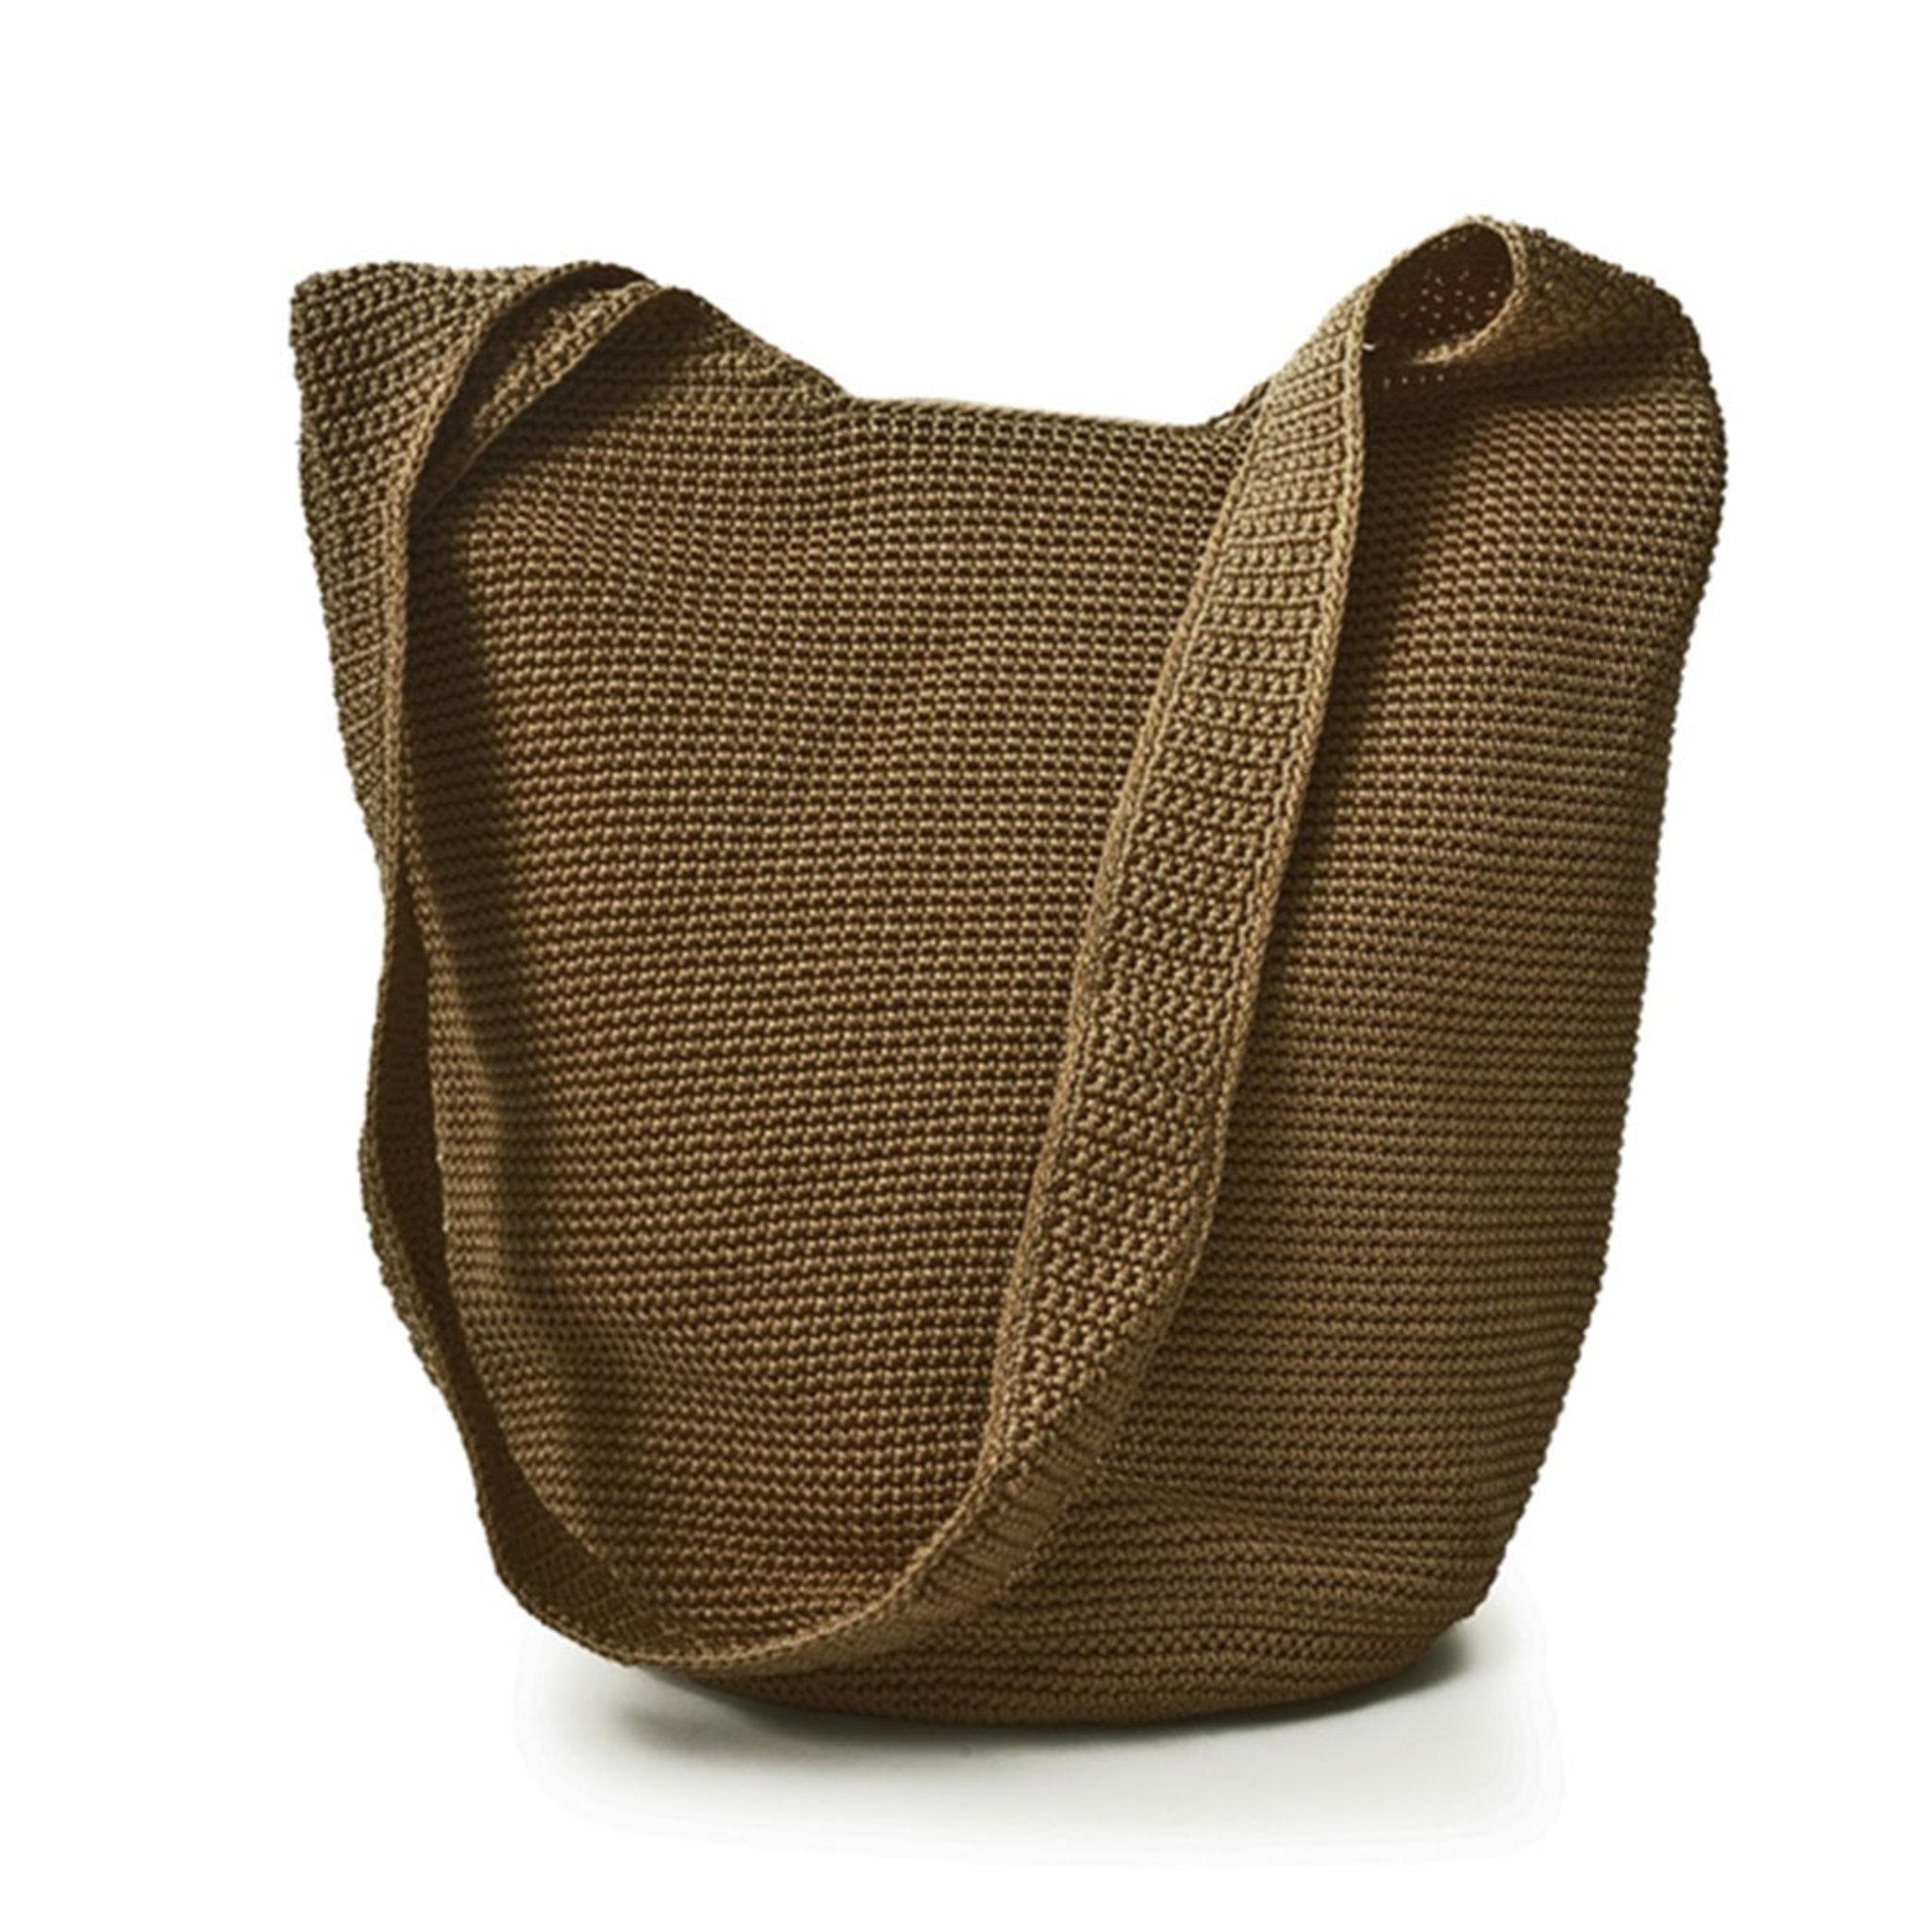 Body Bag Wood Crochet